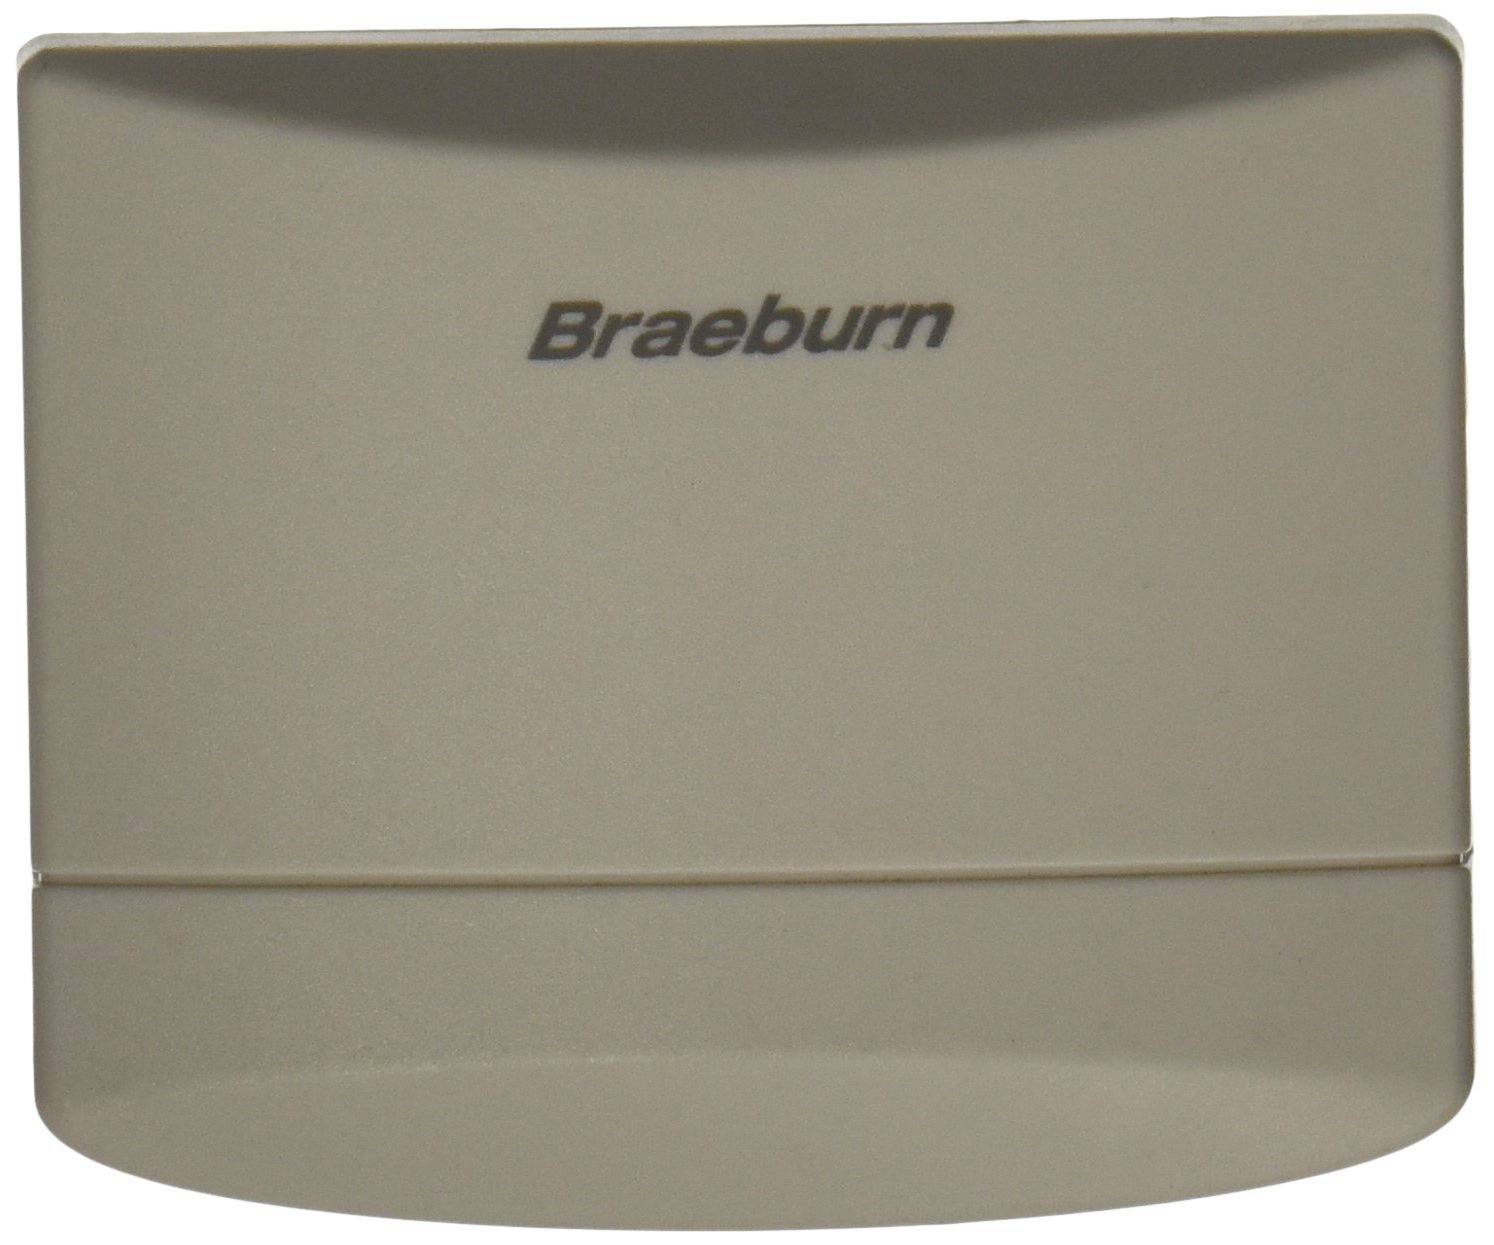 BRAEBURN 5390 Thermostat Remote Indoor Sensor